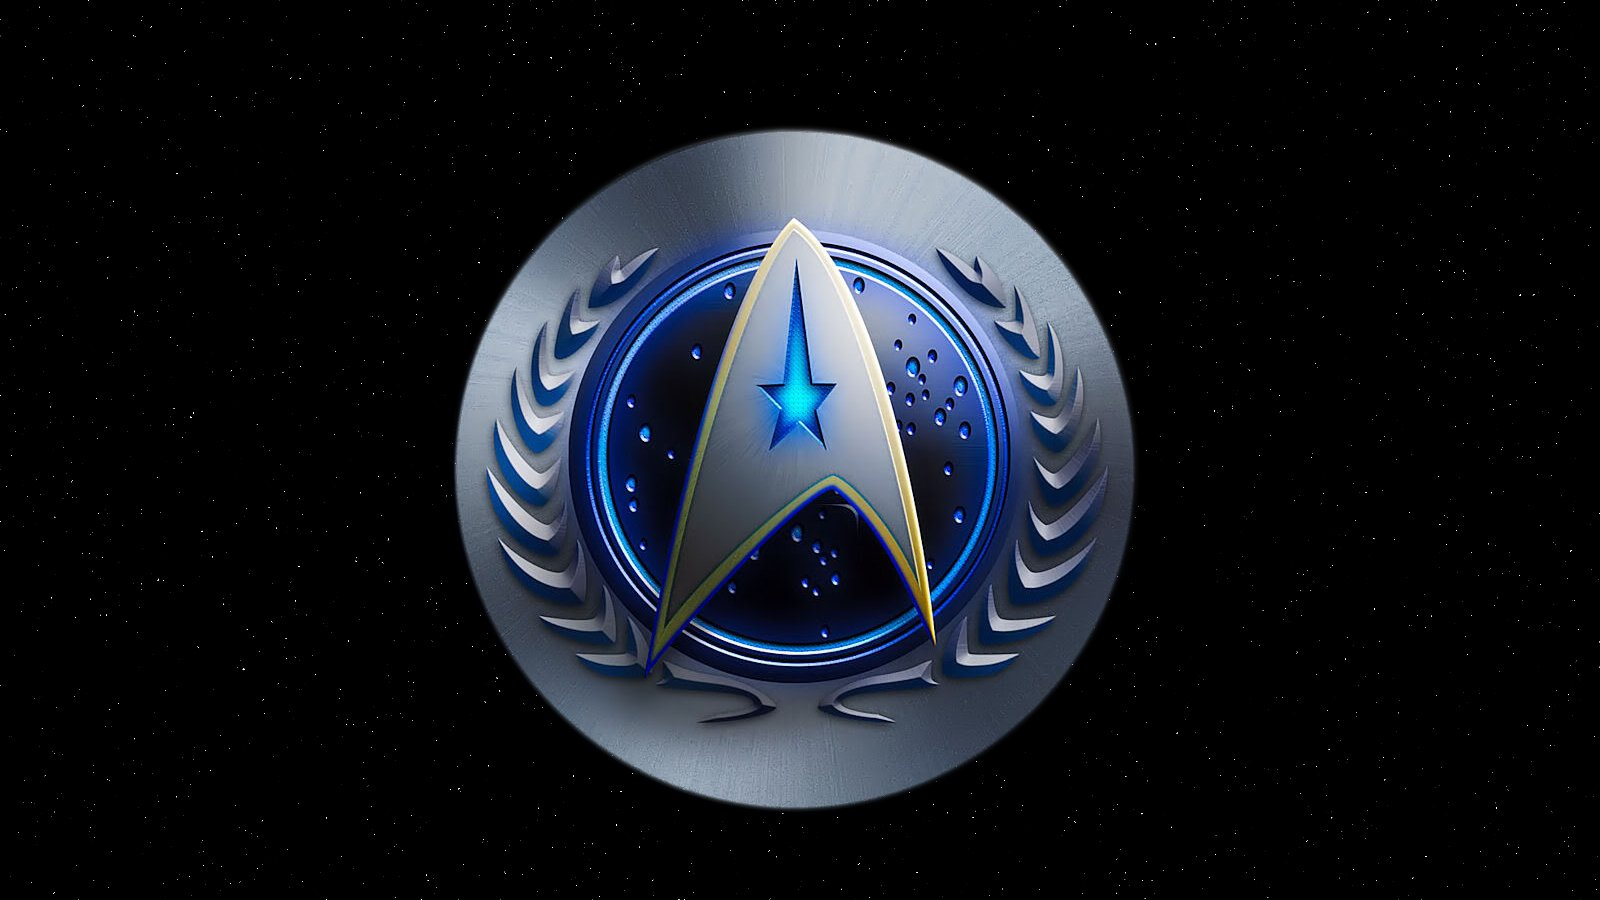 1316 Star Trek HD Wallpapers